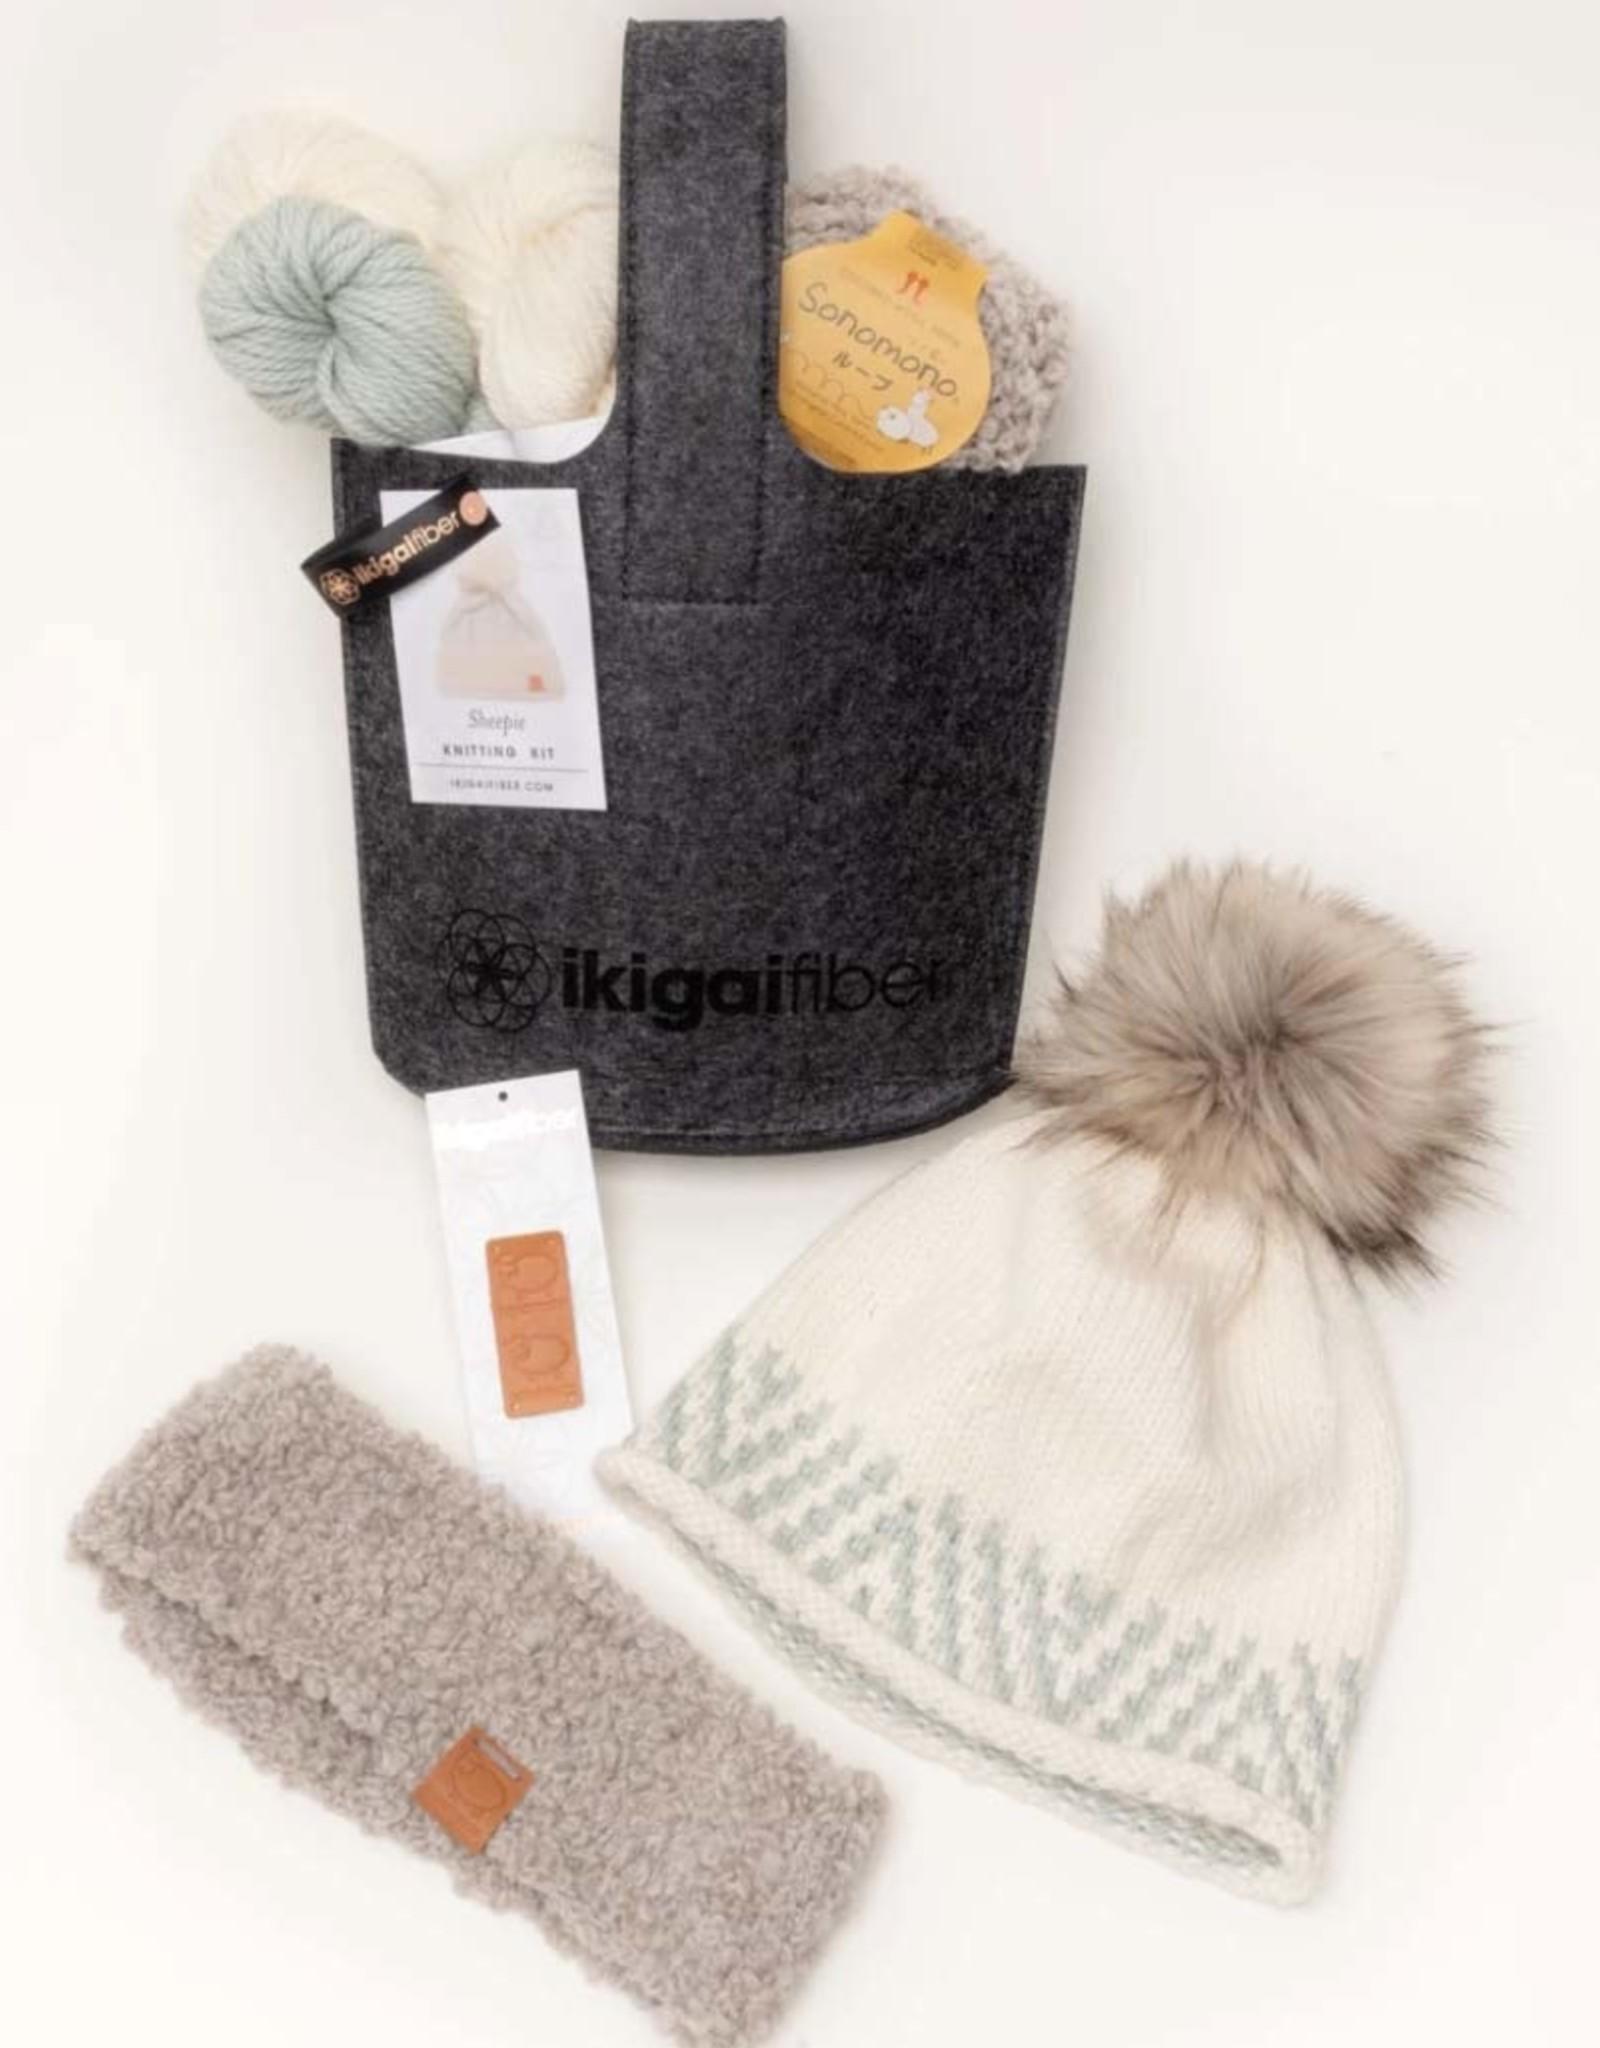 Ikigai Fiber Sheepie Hat Kit